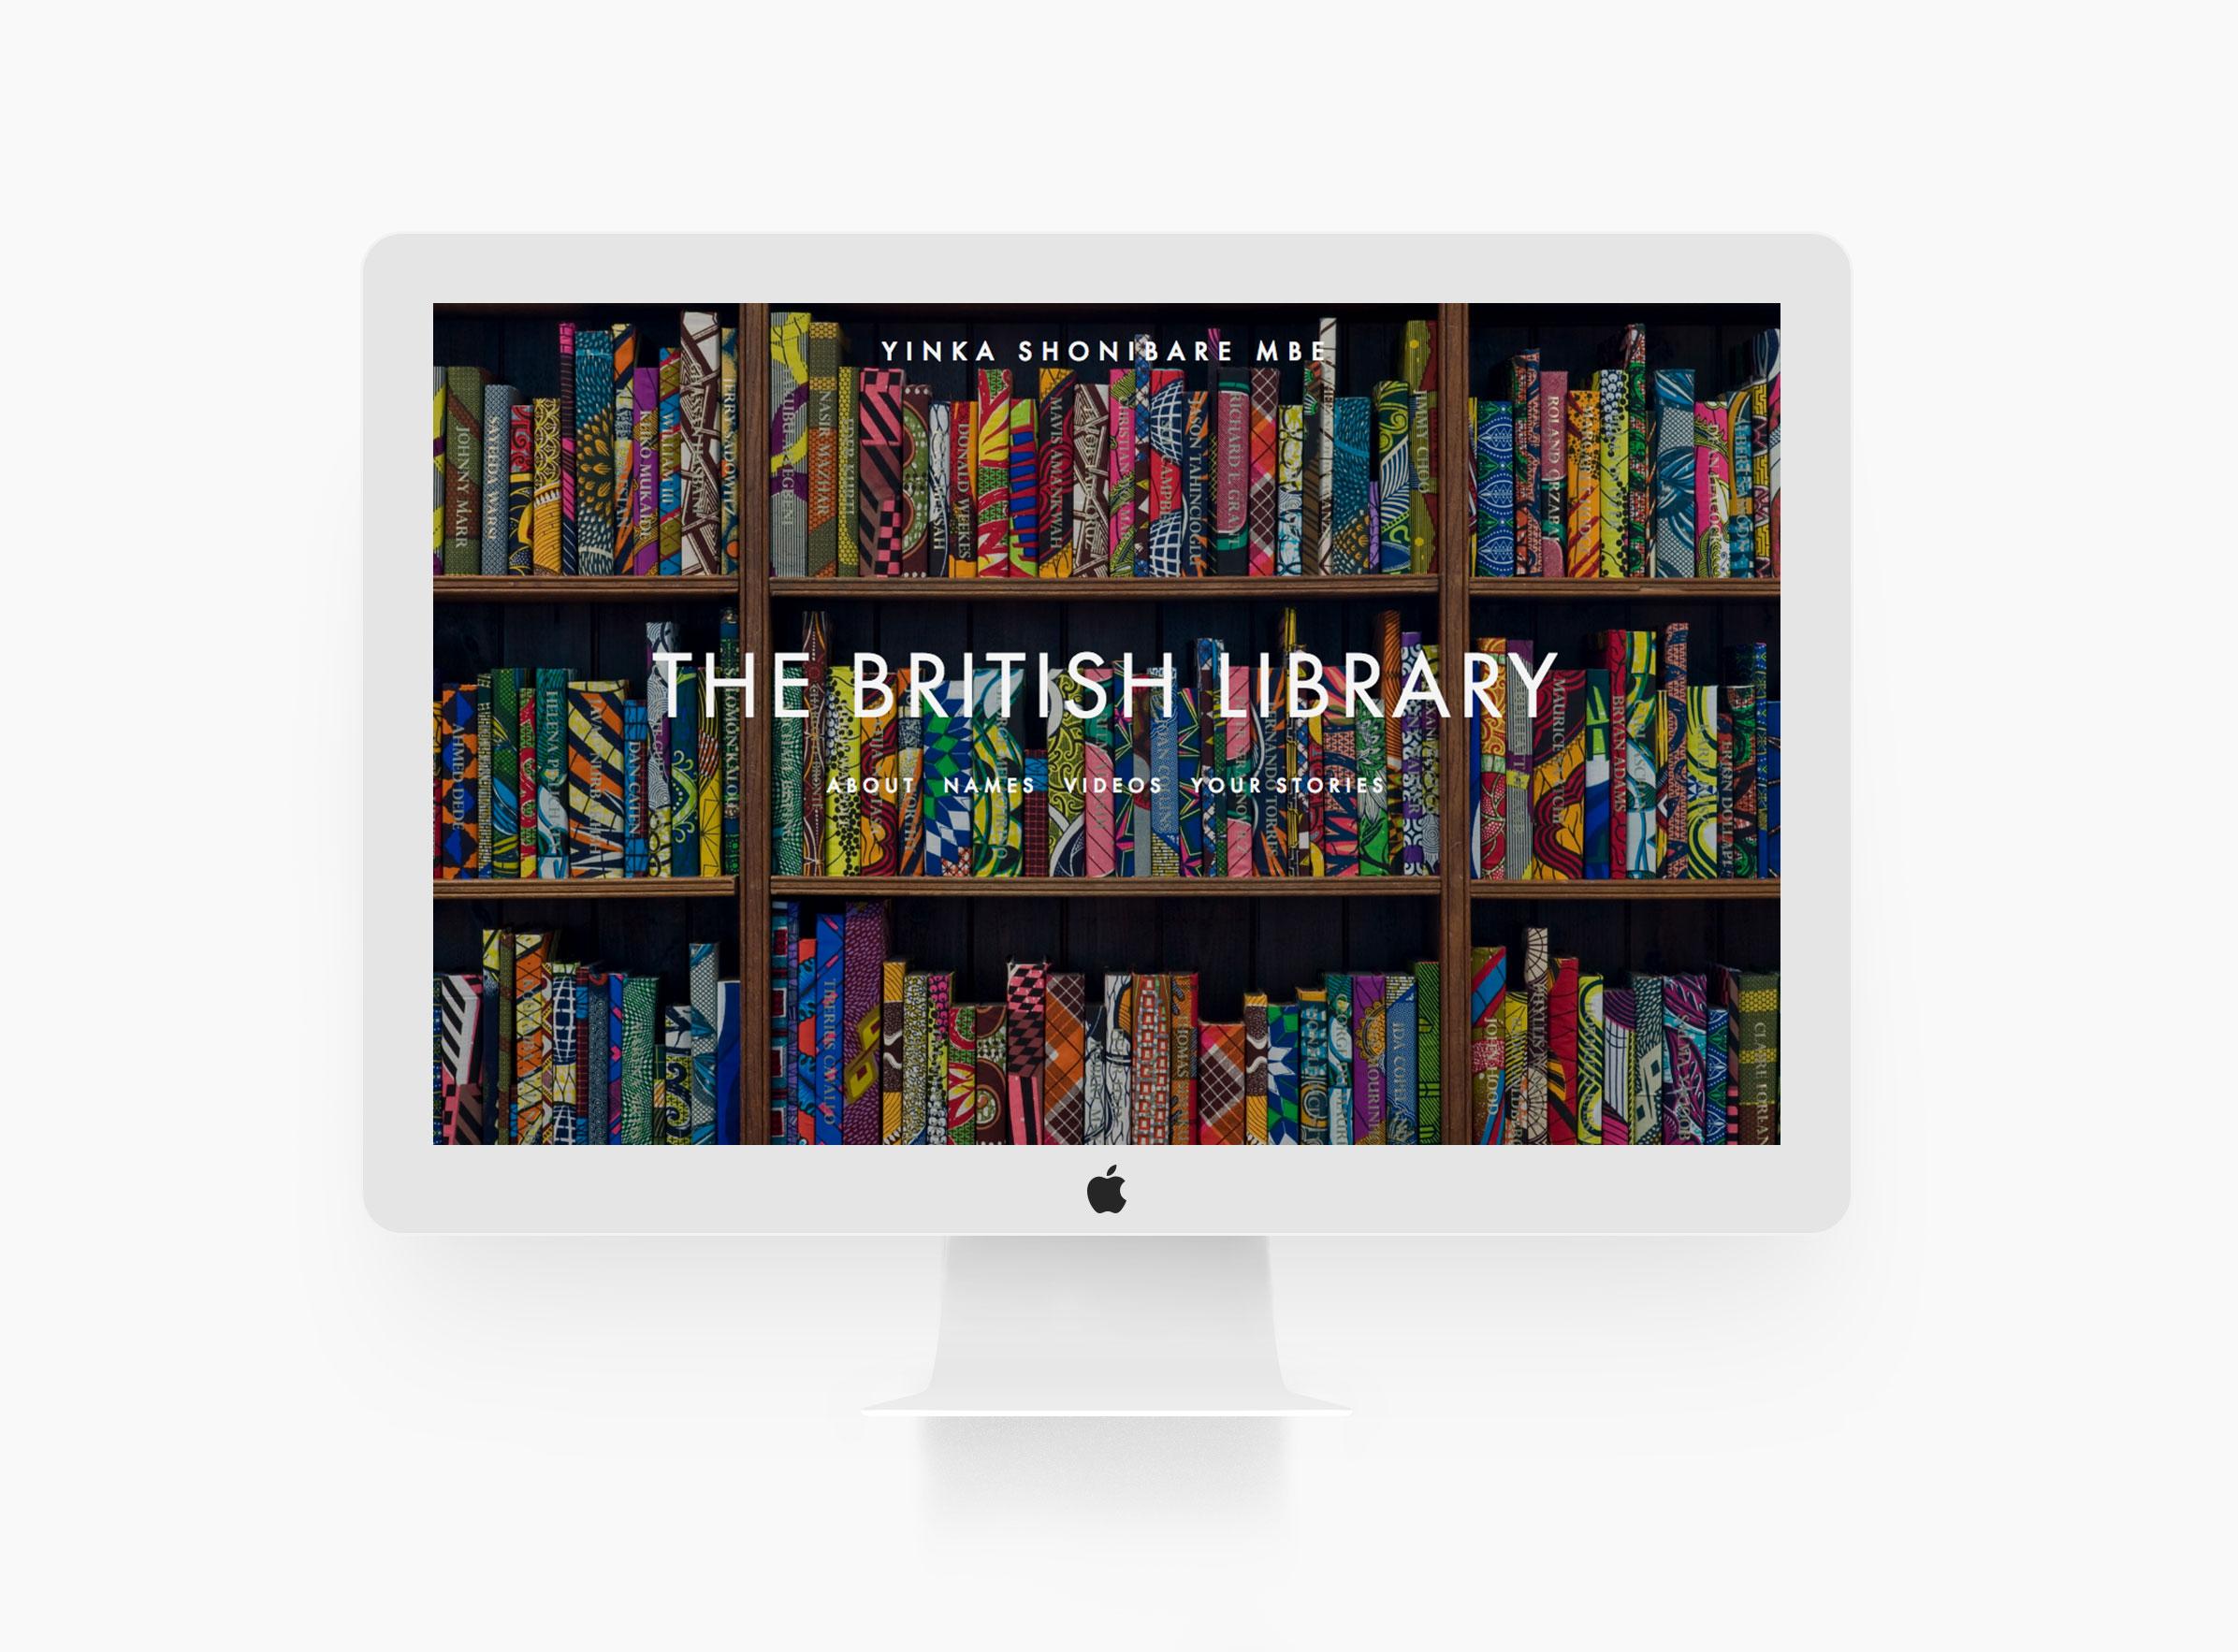 Web-Design-for-Artists-and-Creatives_Yinka-Shonibare-British-Library-Home.jpg